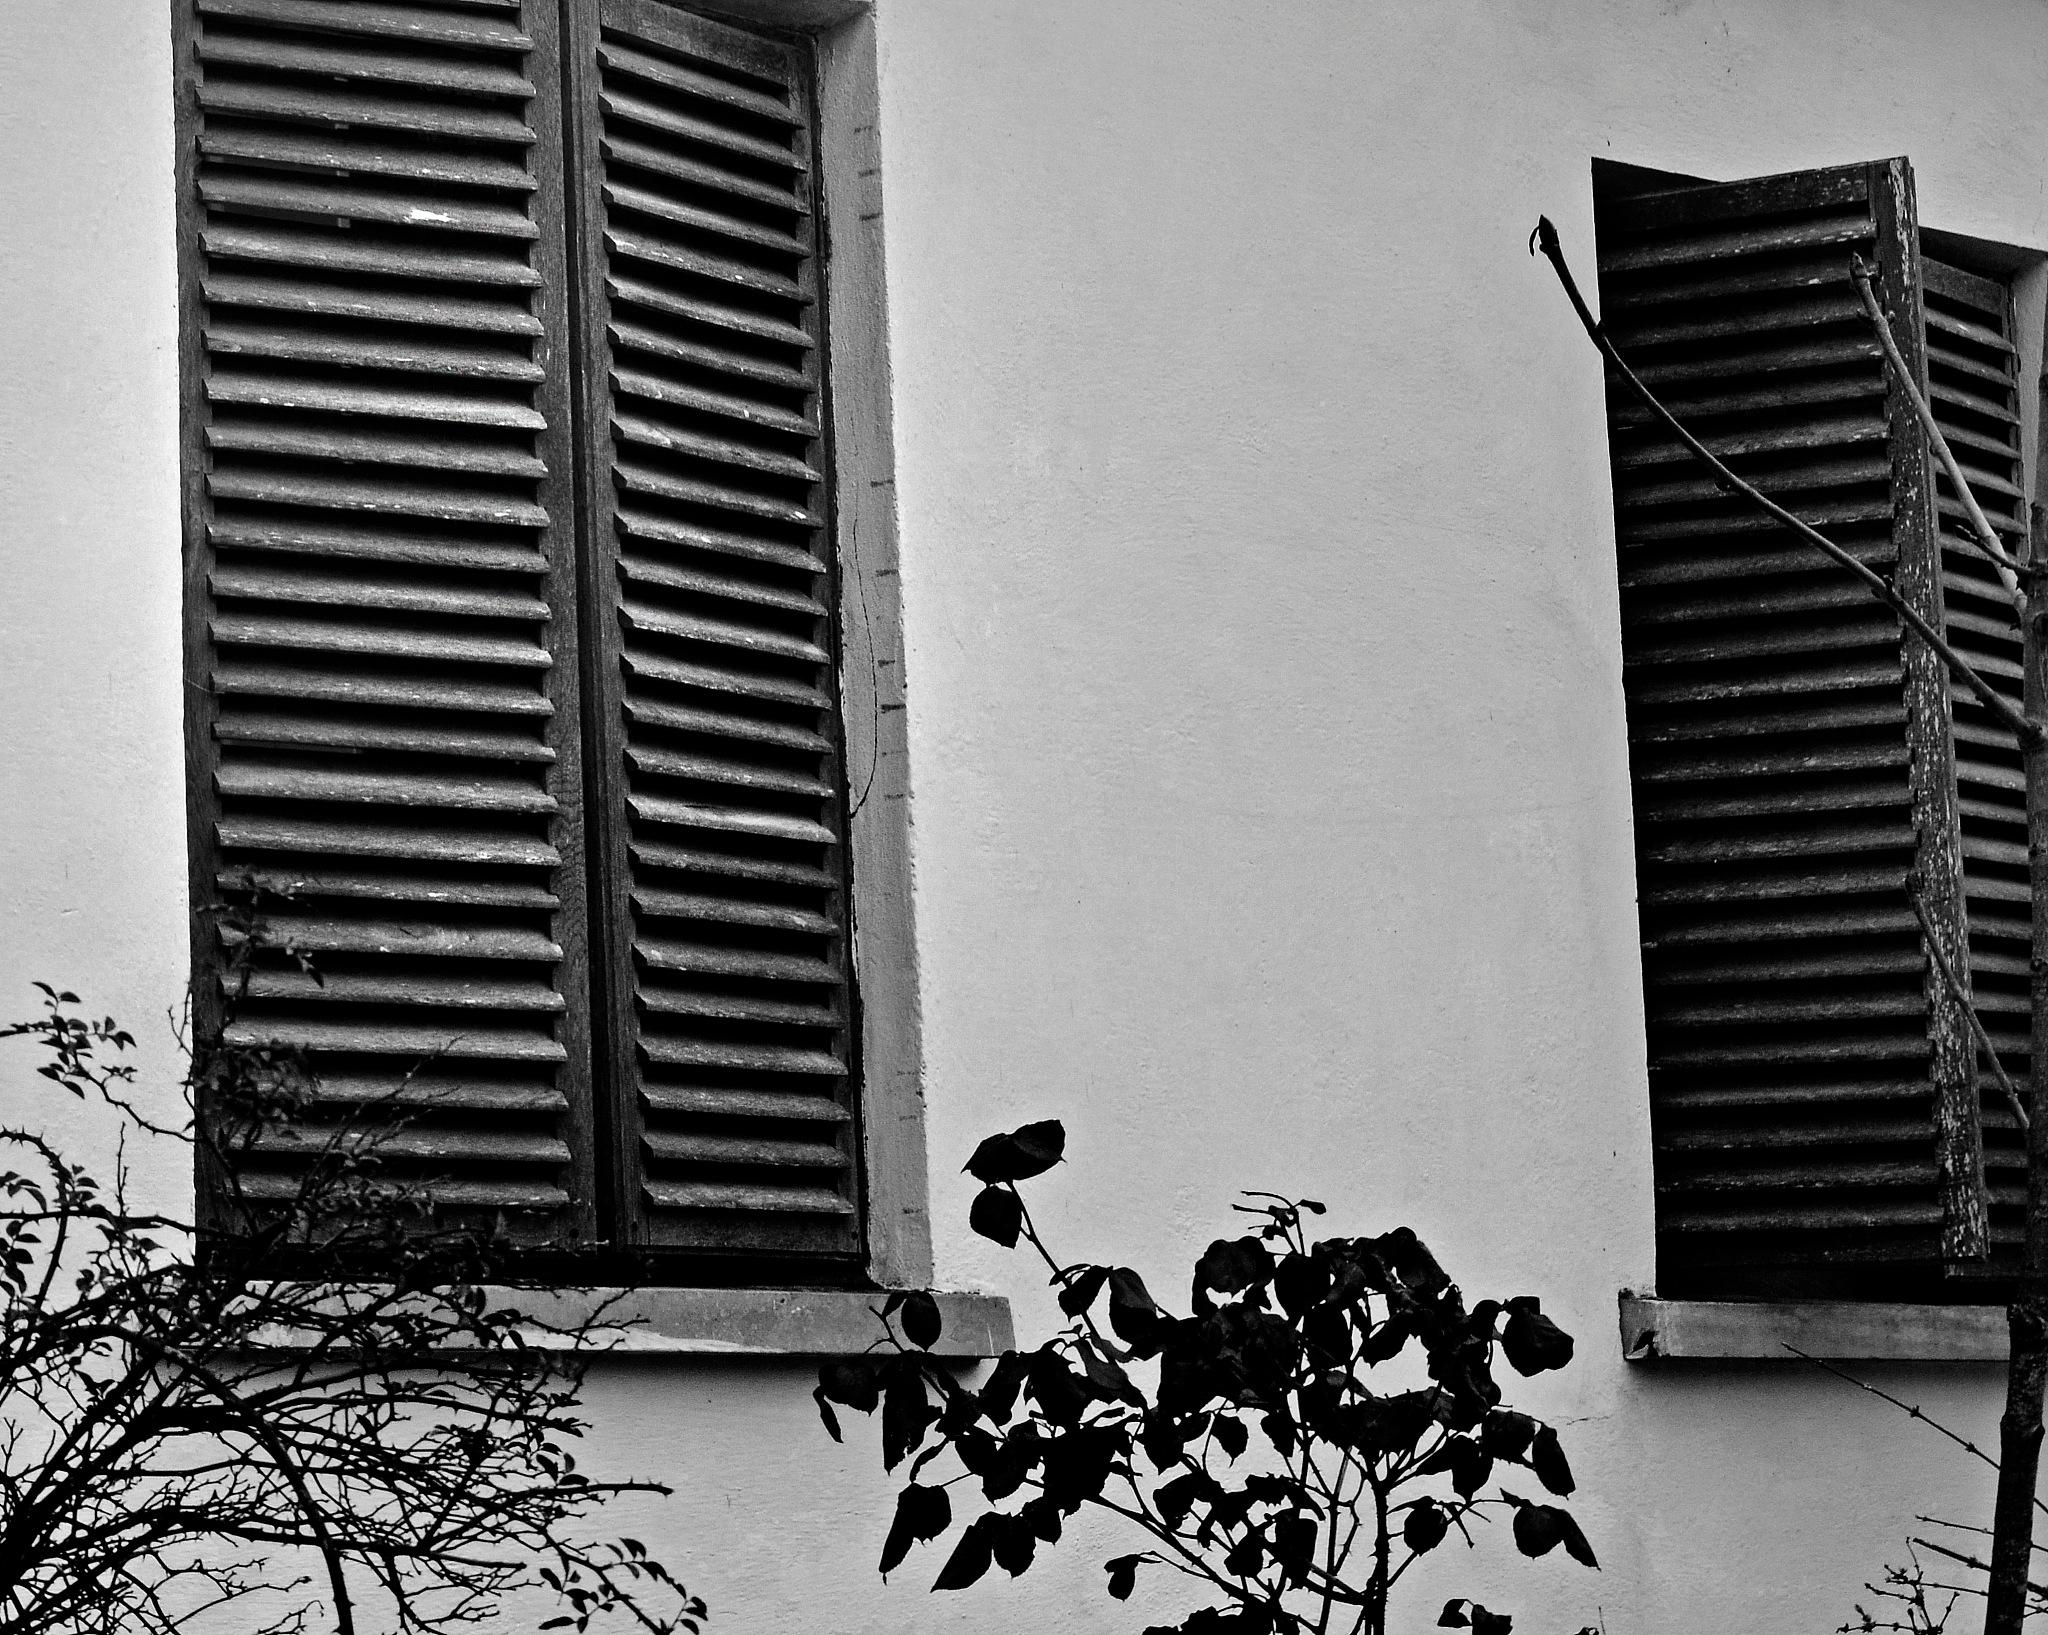 Untitled by guritaalex